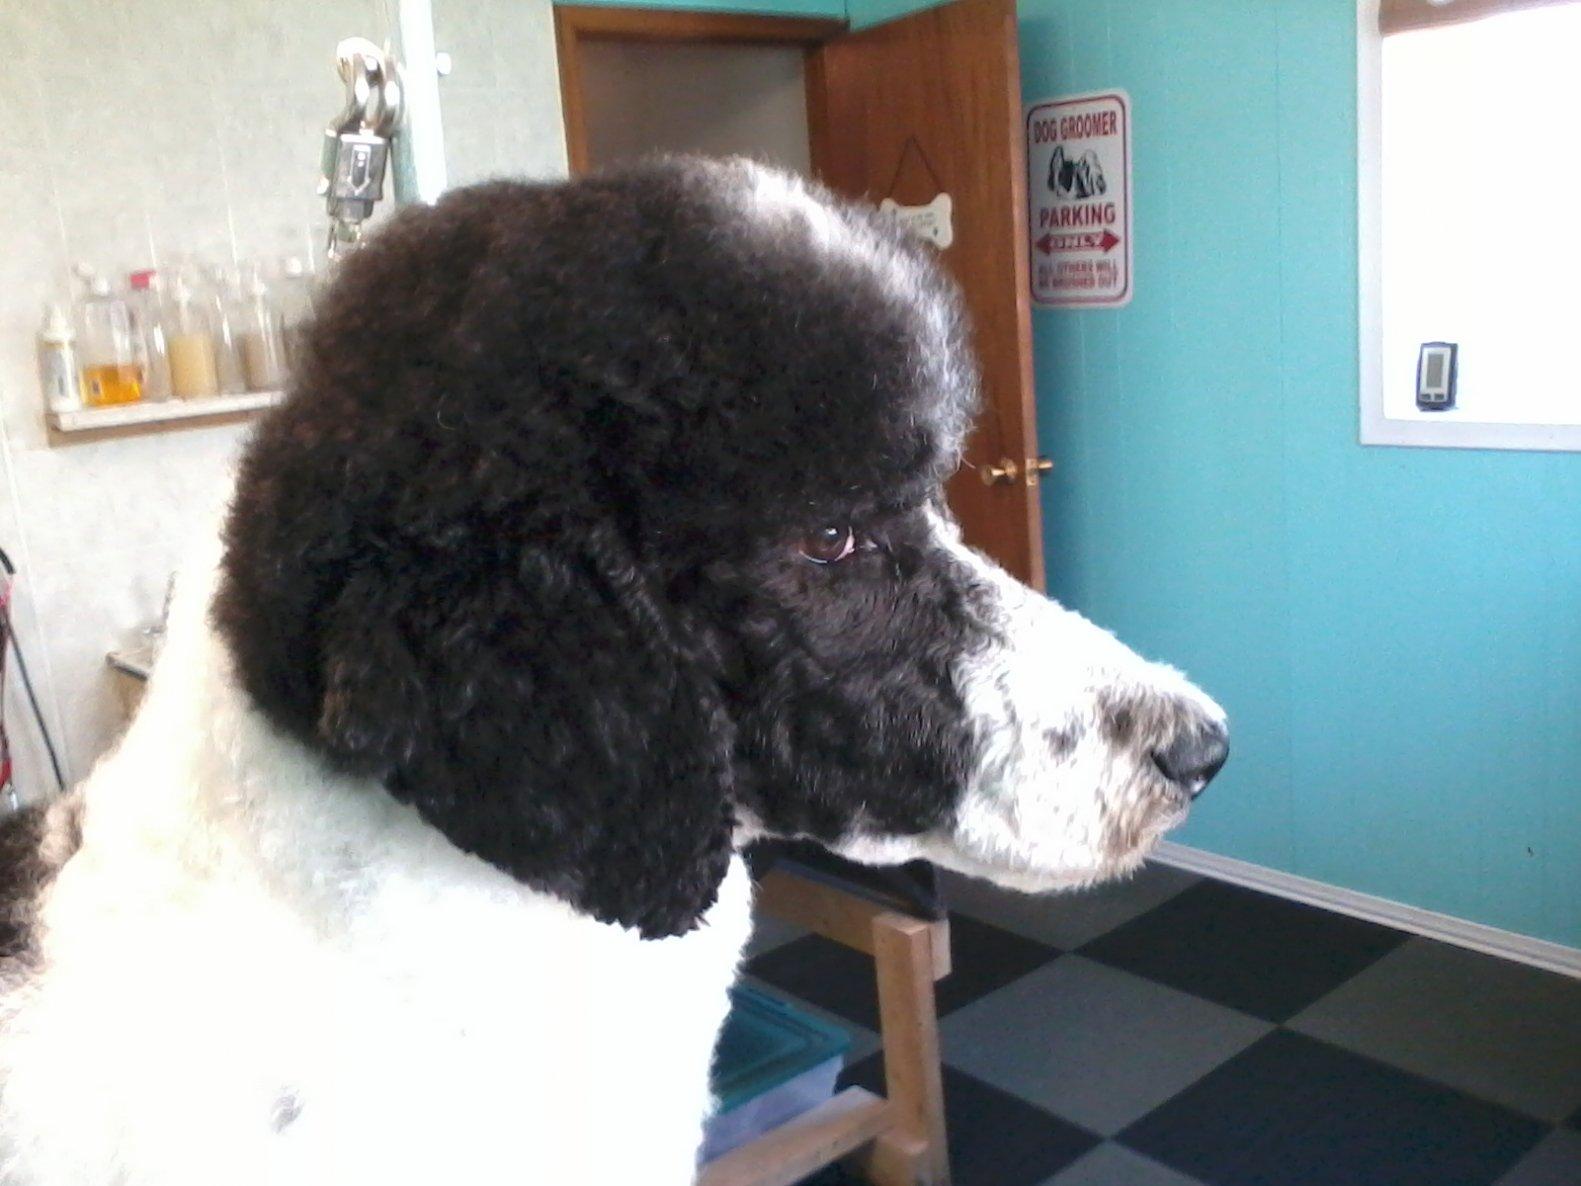 to get a rescue poodle - Poodle Forum - Standard Poodle, Toy Poodle ...